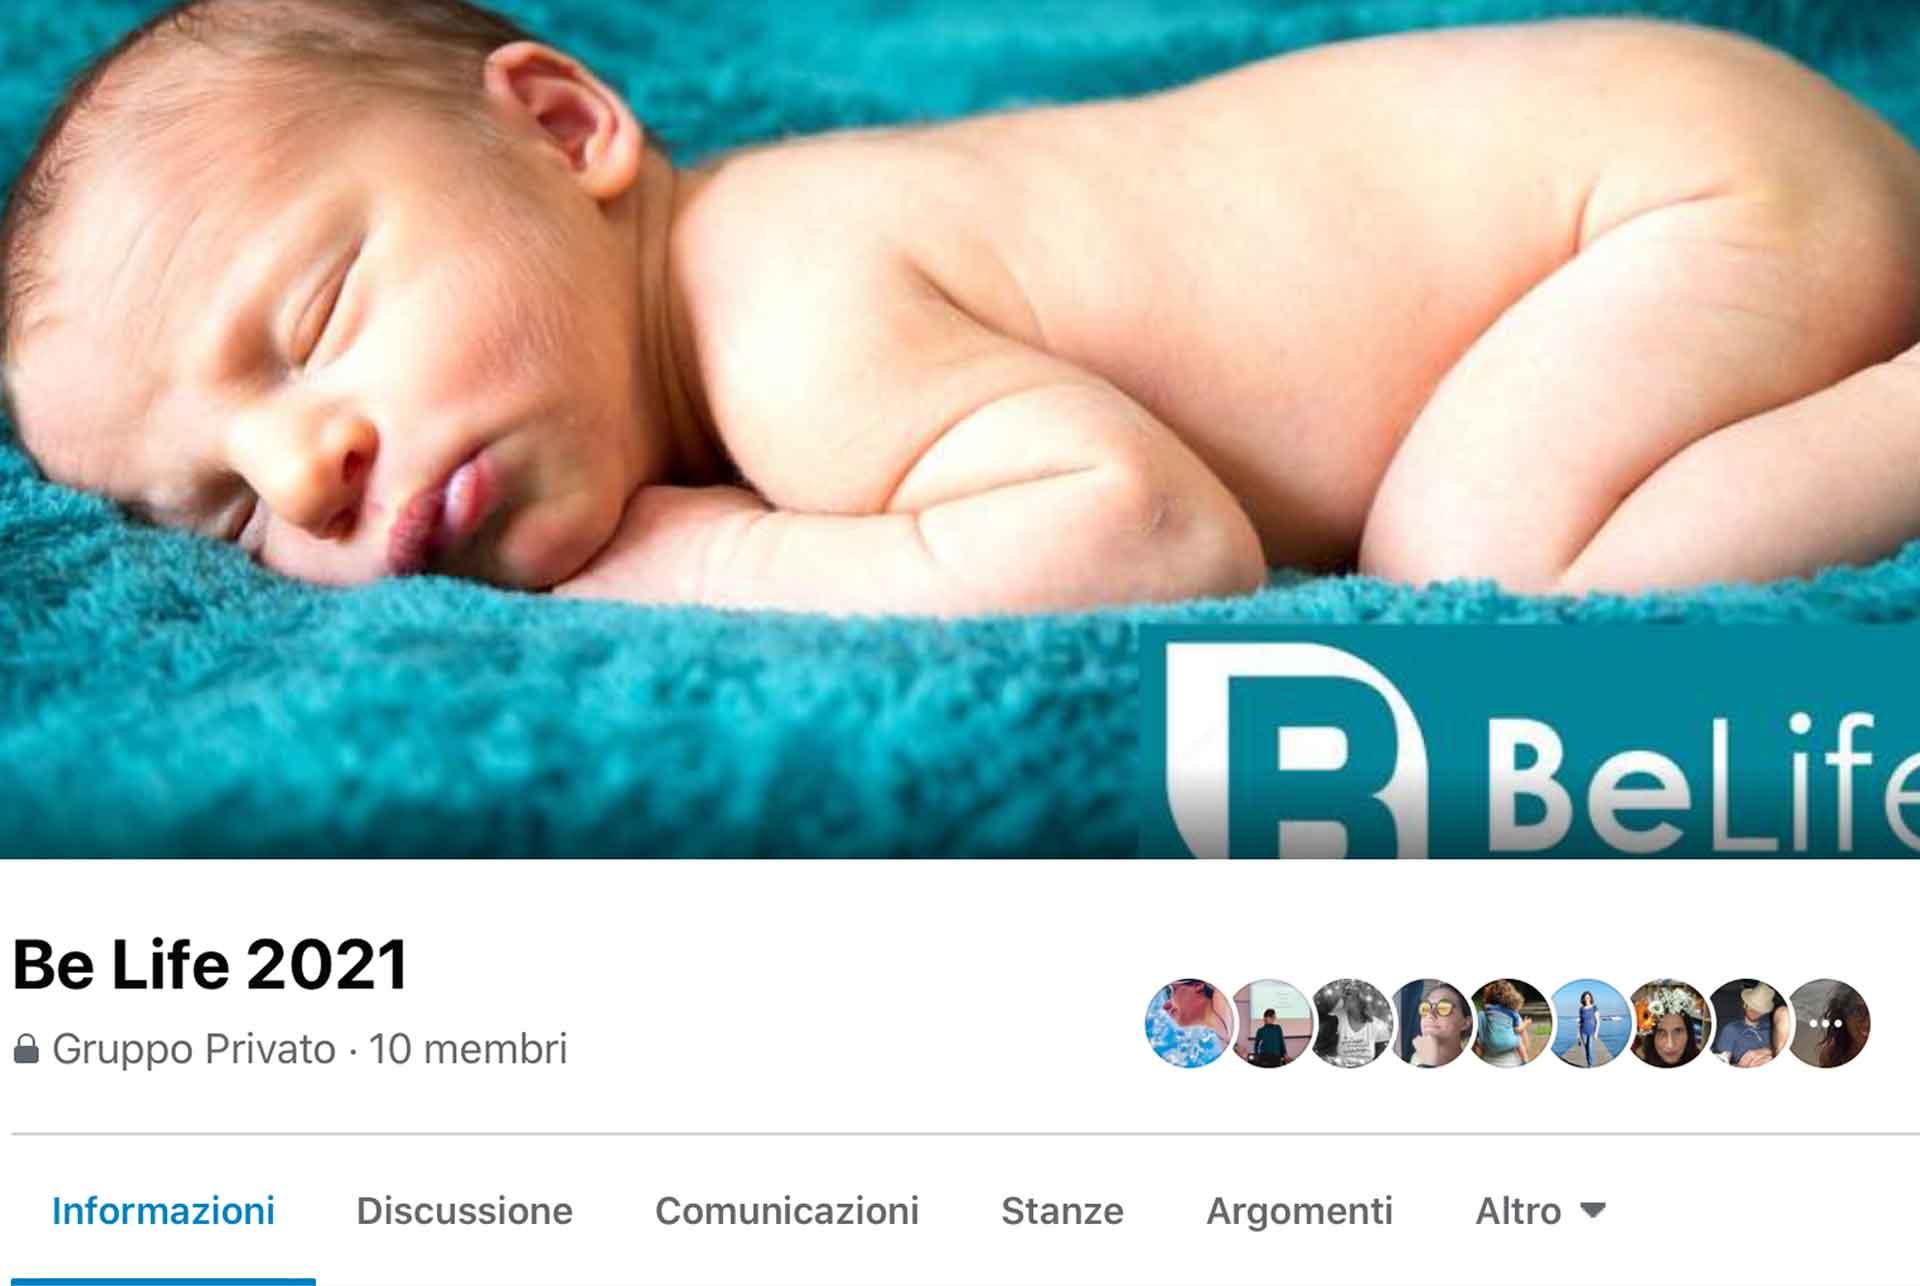 Be Life 2021 community Facebook